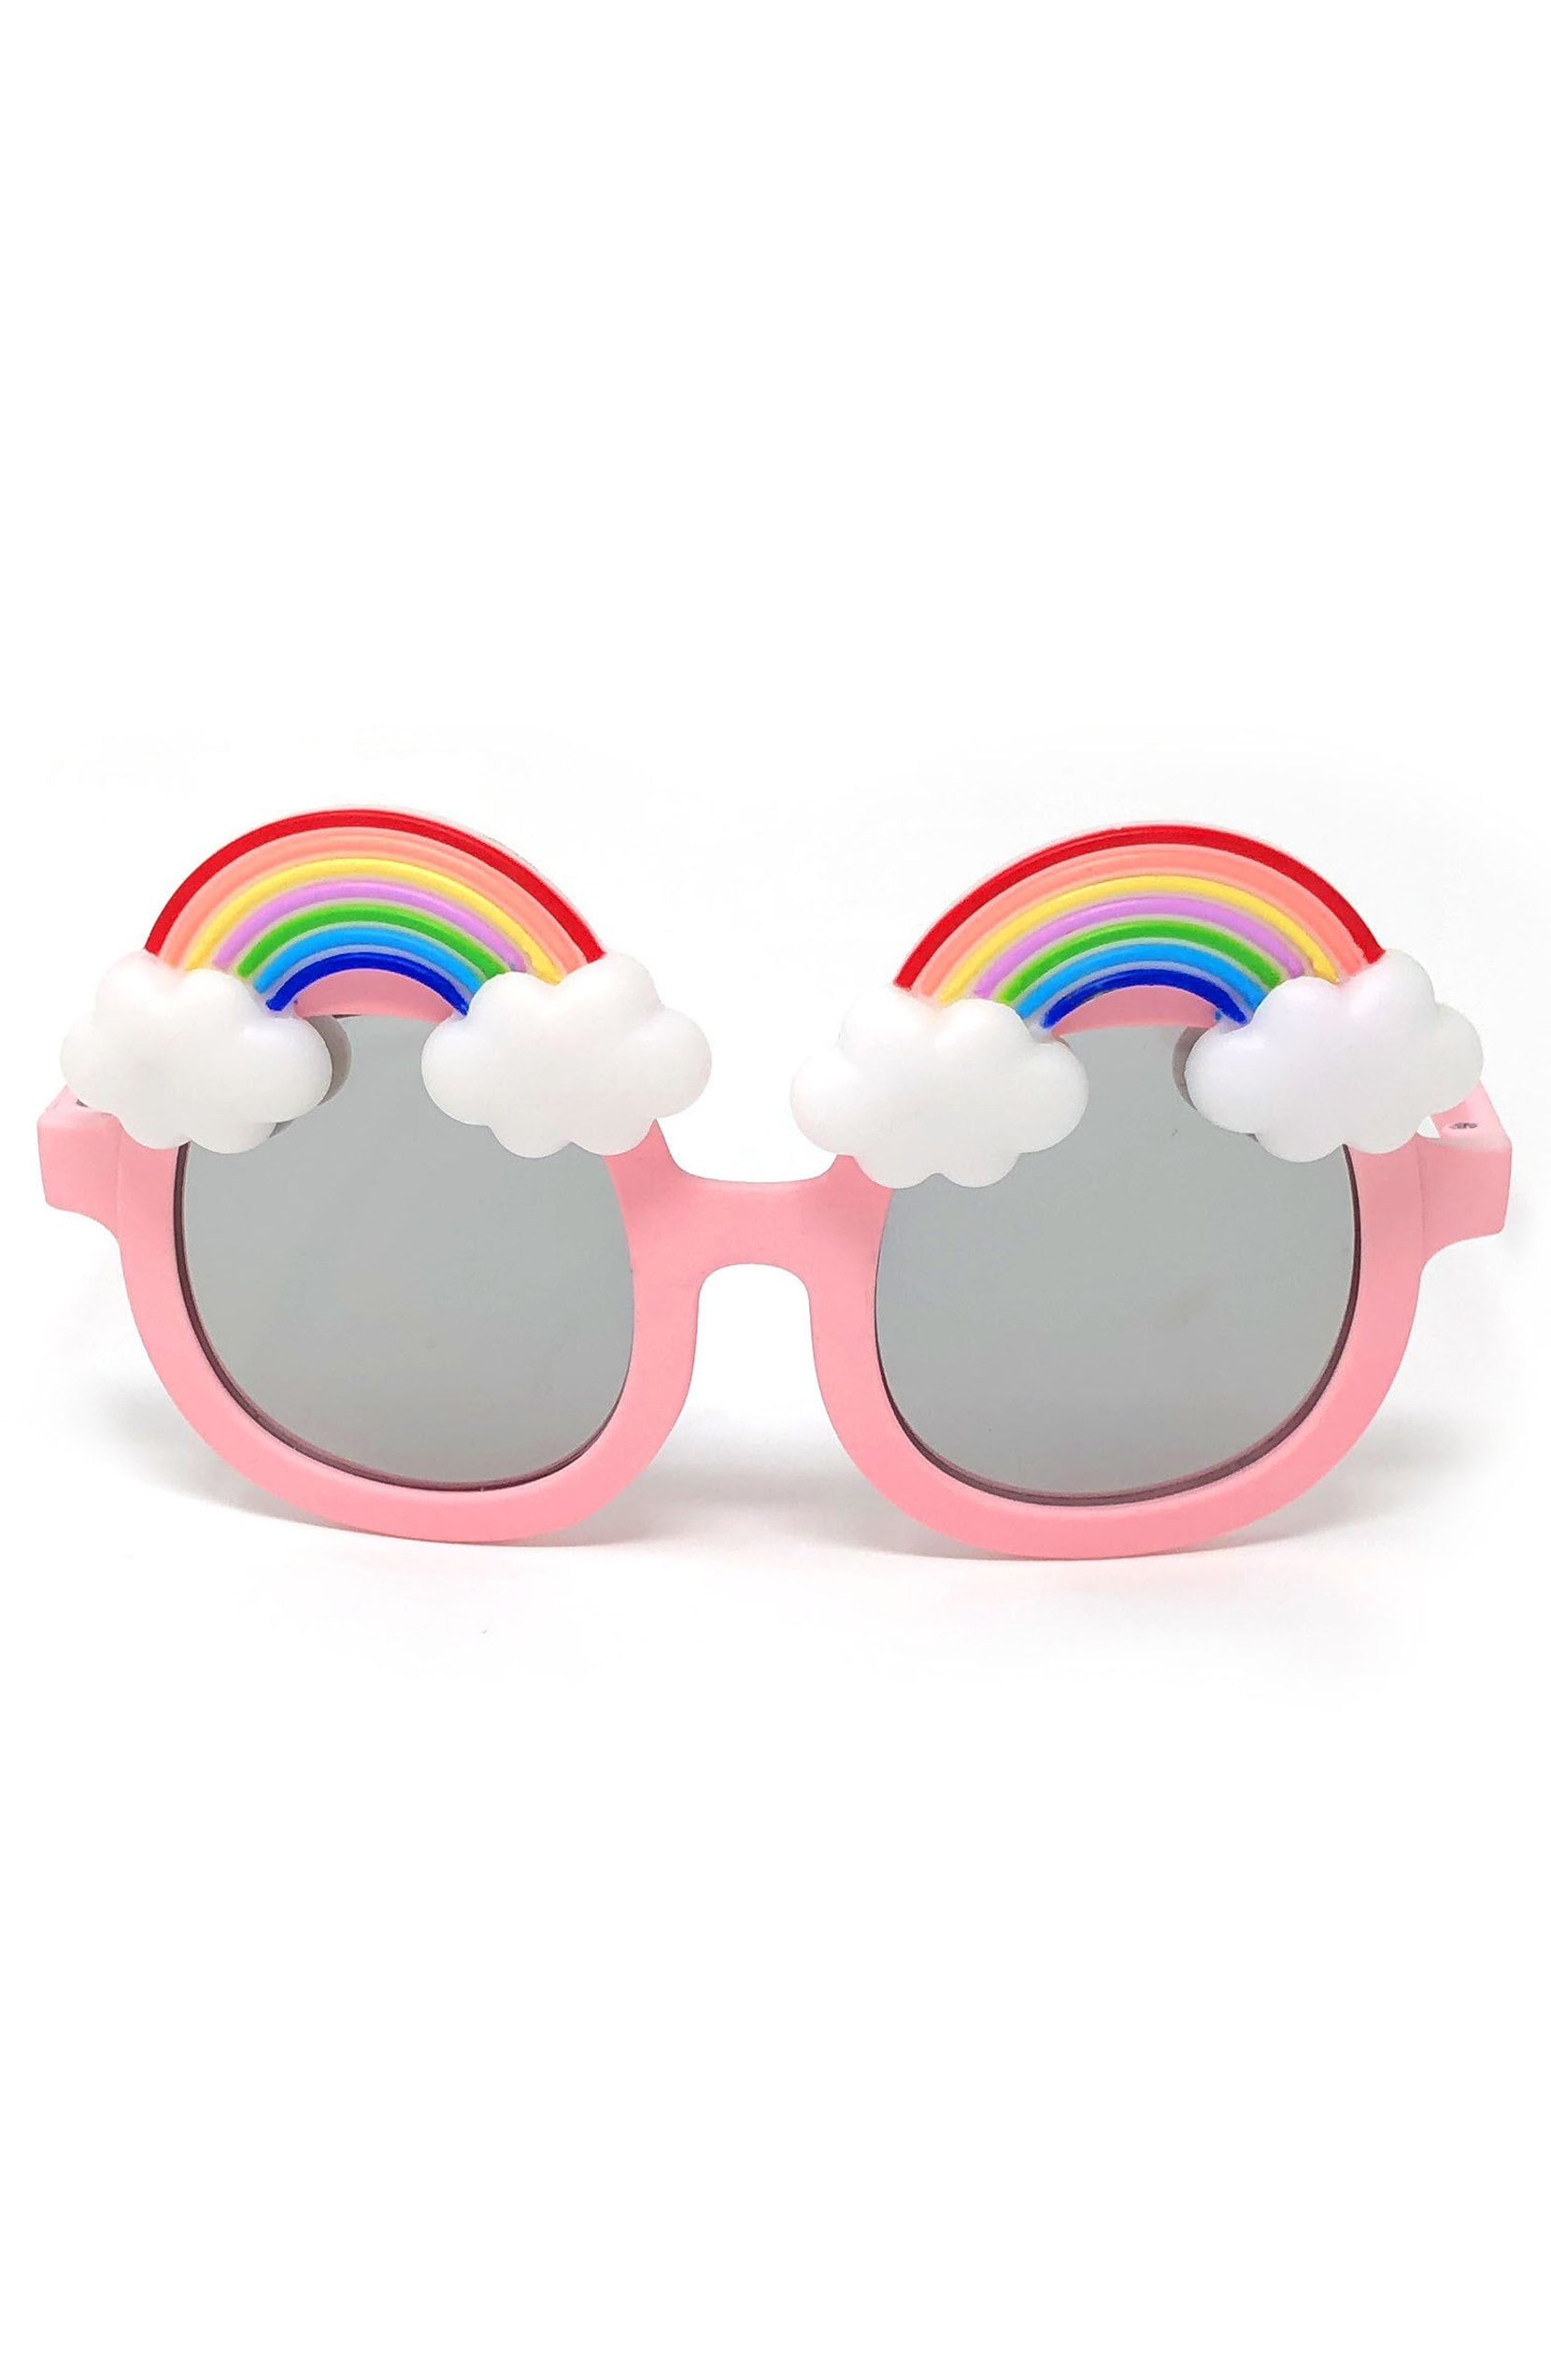 9e1242794c Large Round Rainbow Sunglasses